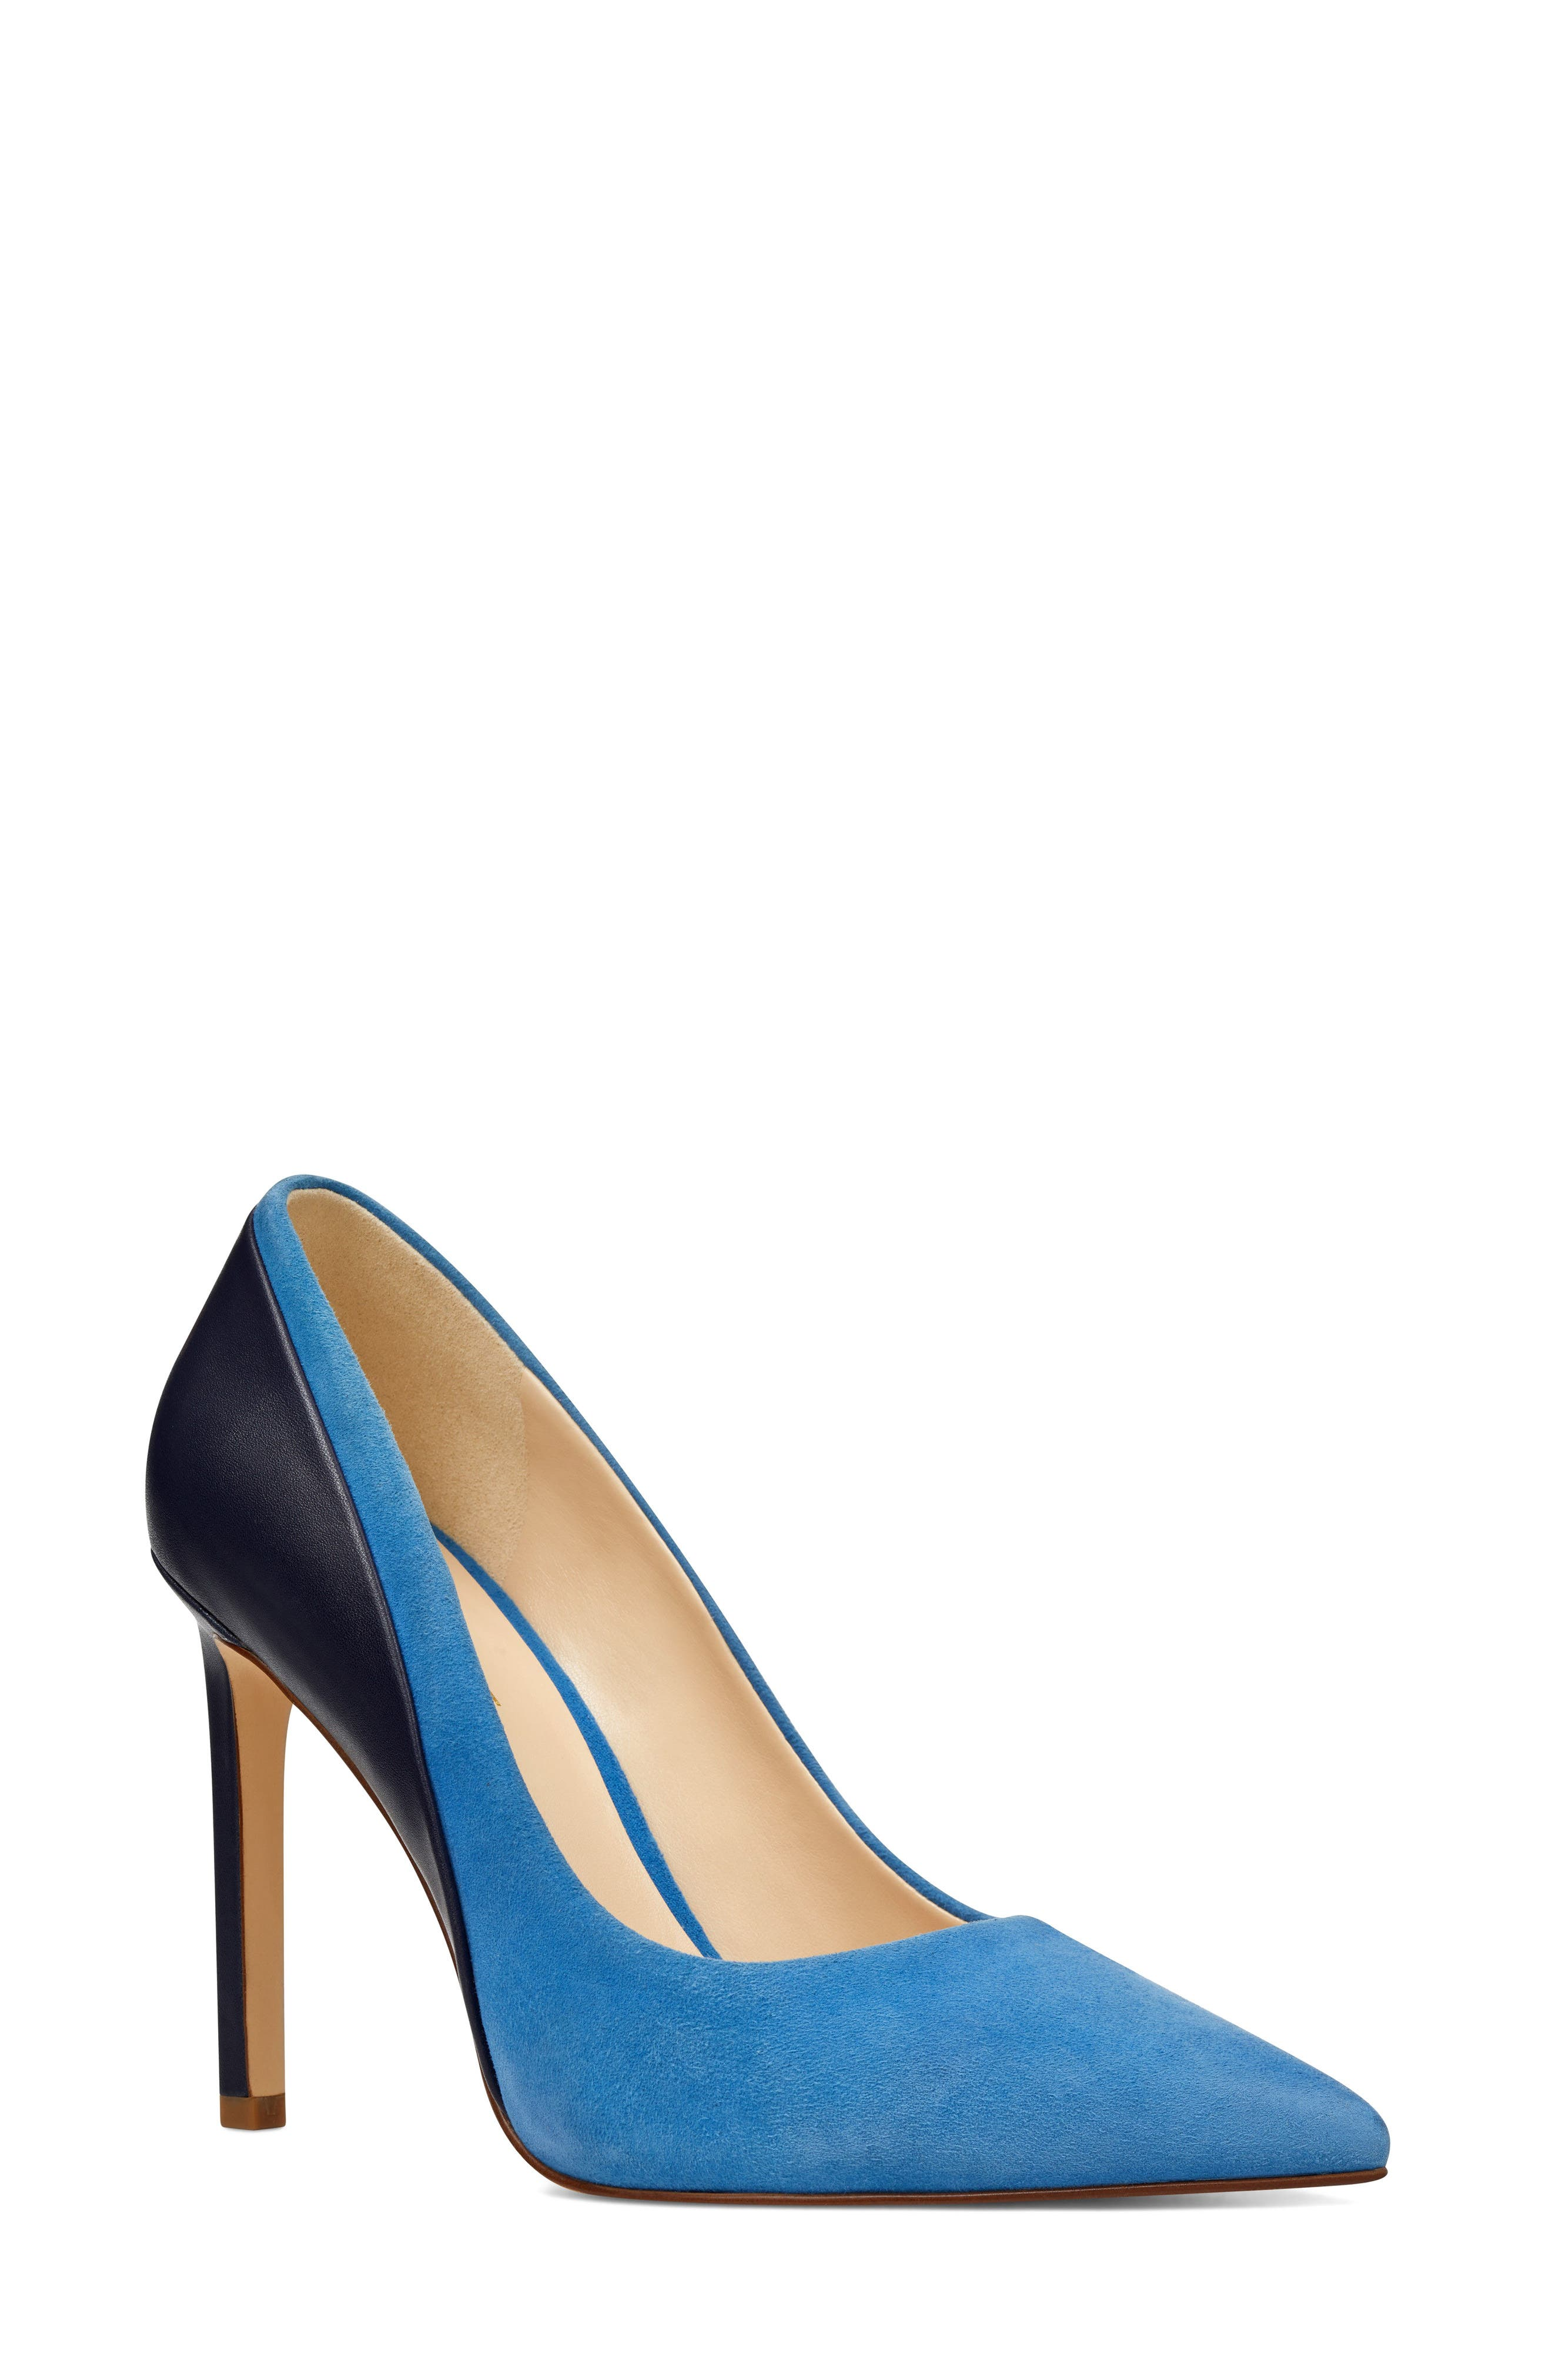 Taymra Pointy Toe Pump,                         Main,                         color, BLUE/ NAVY SUEDE